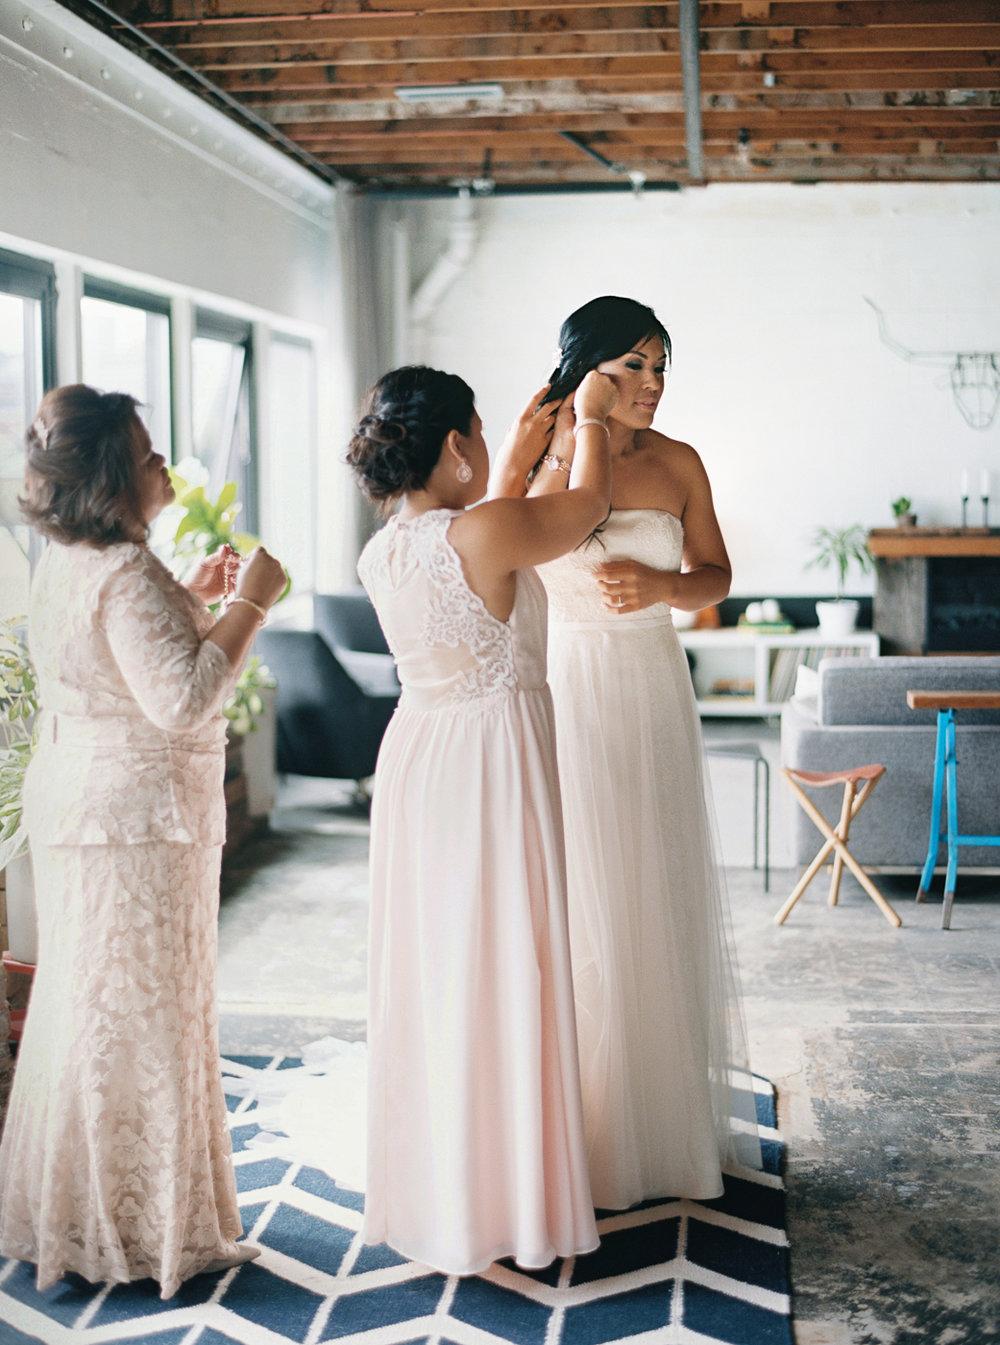 014Union_Pine_Portland_Oregon_Wedding_Photography.jpg